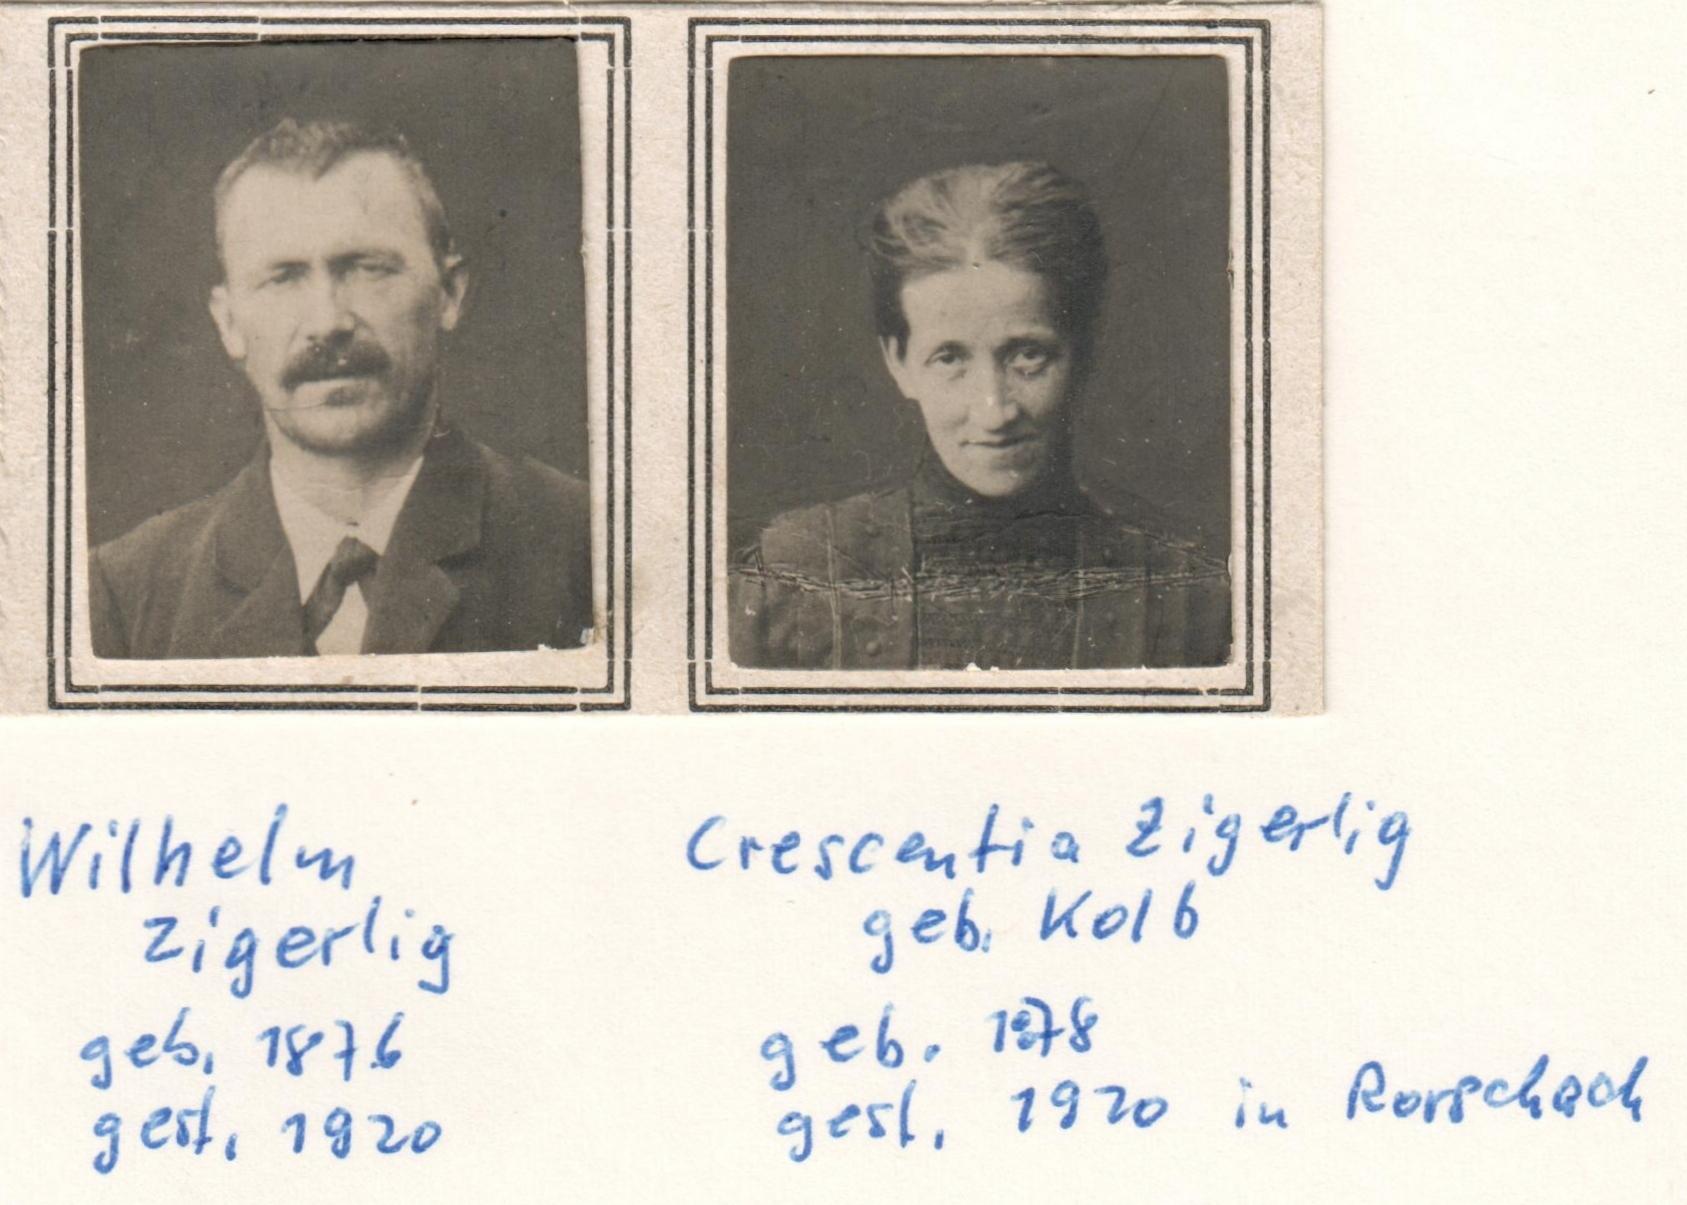 Wilhelm Zigerlig (1874-1920)